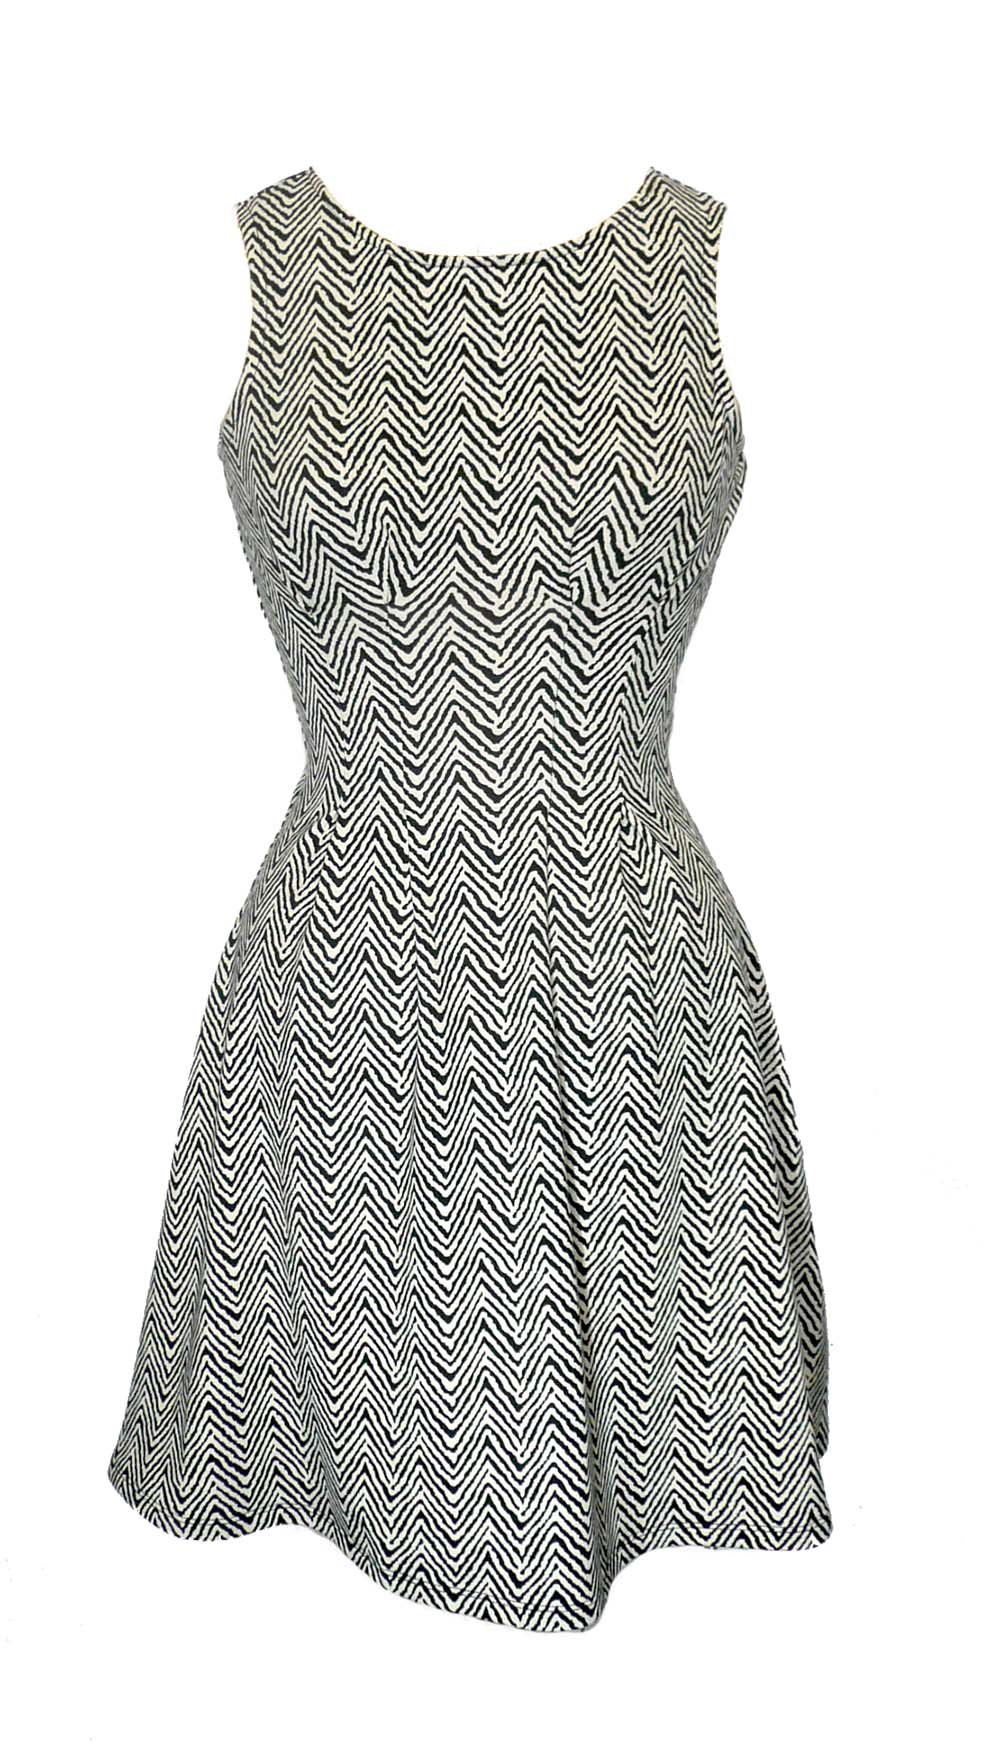 dress herringbone.jpg